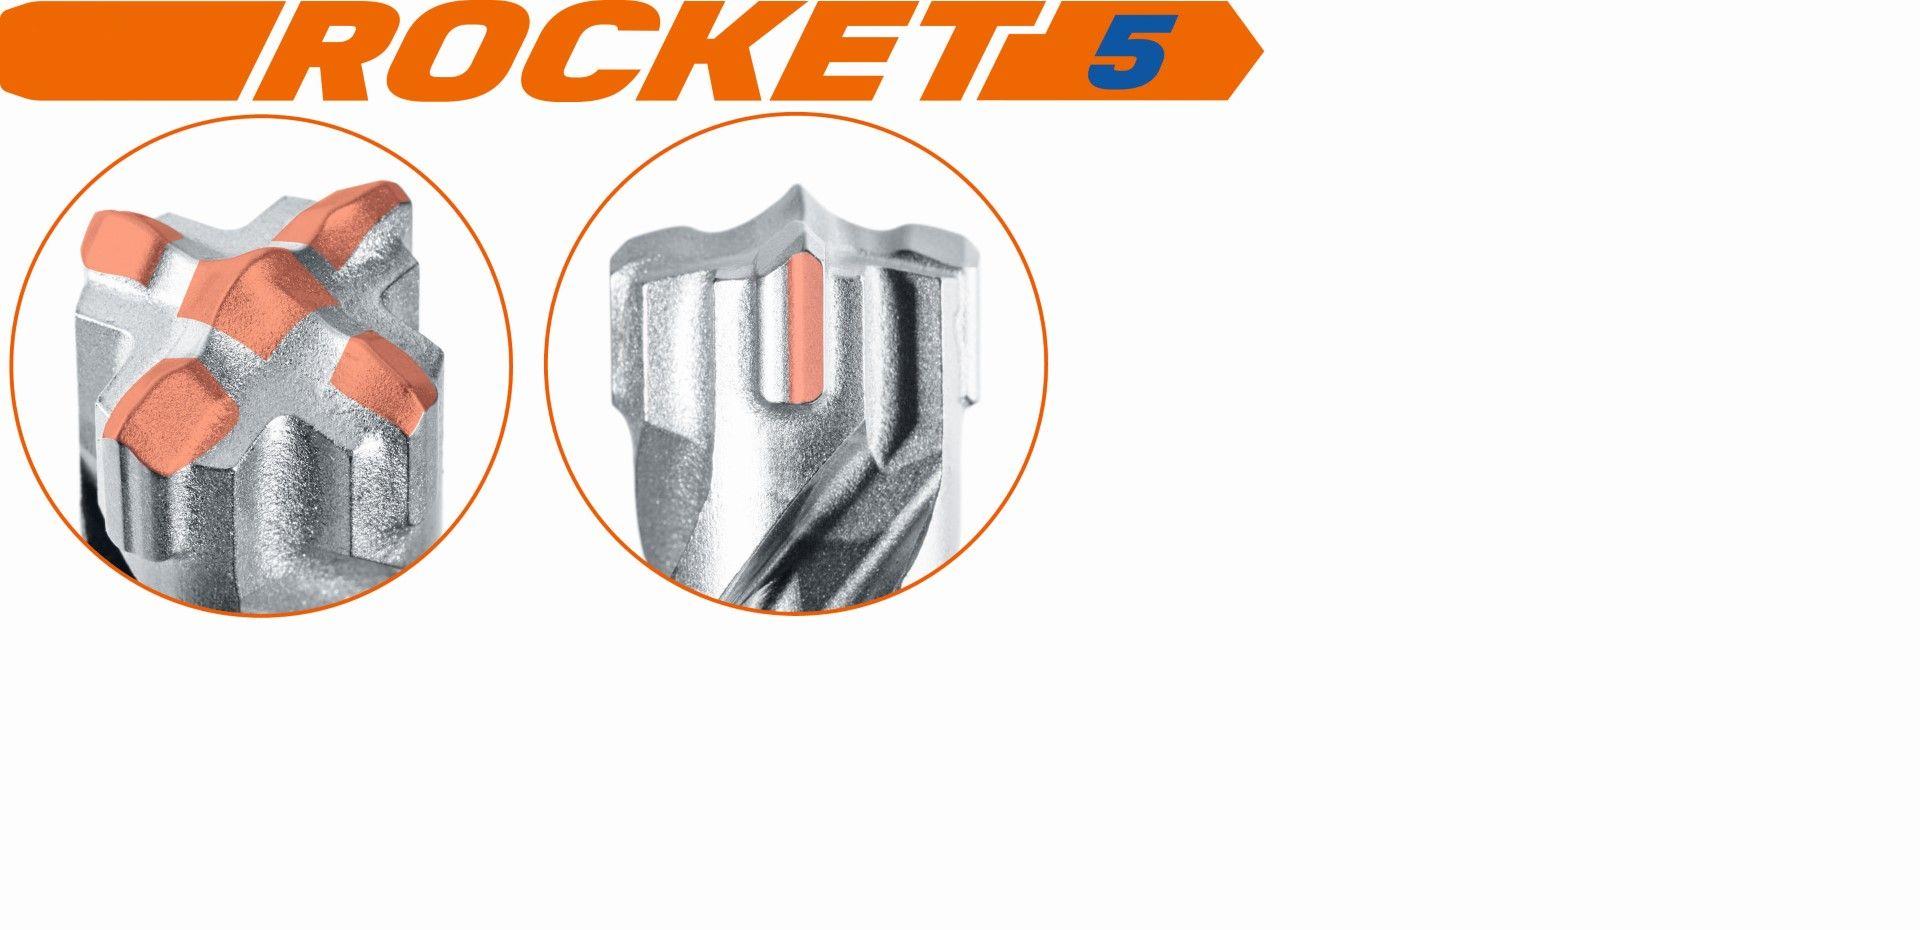 Slika BORER Rocket 5 SDS-plus 12x210mm 4-kraka